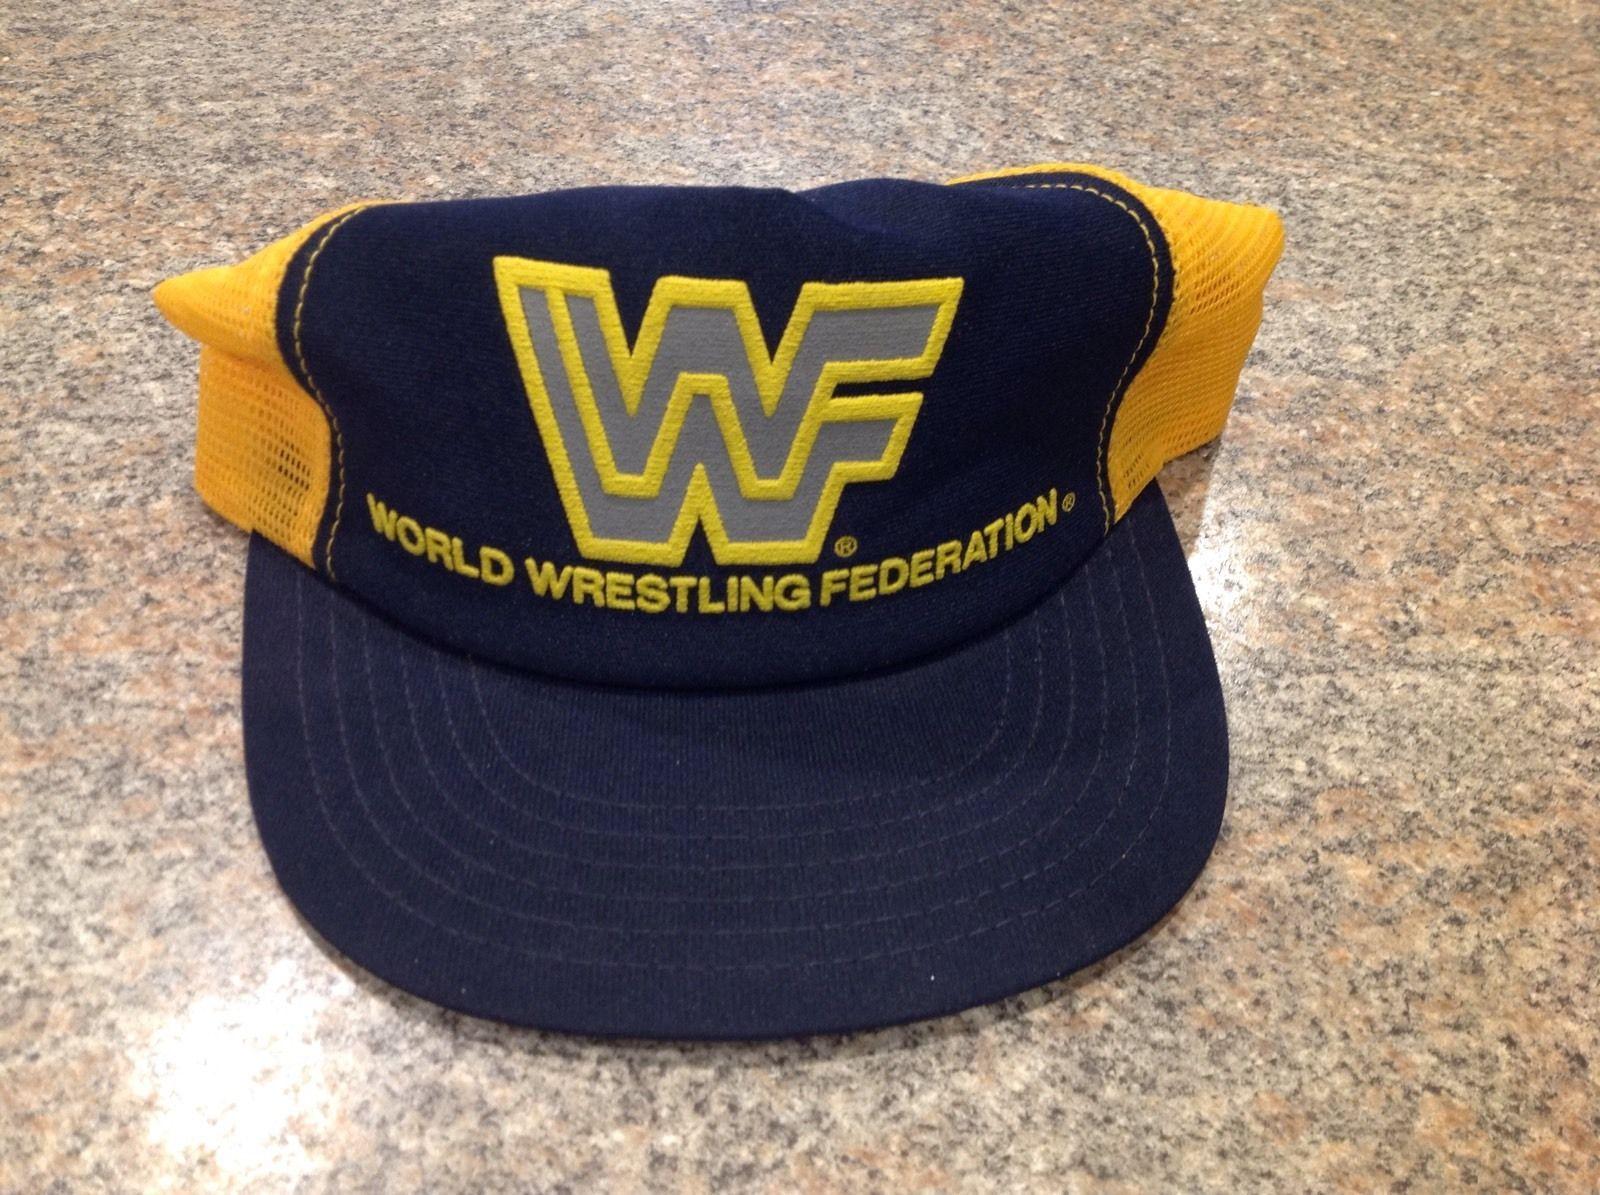 e536e46d RARE OFFICIAL 1988 WWF World Wrestling Federation Logo Mesh Hat Vintage WWE  | eBay